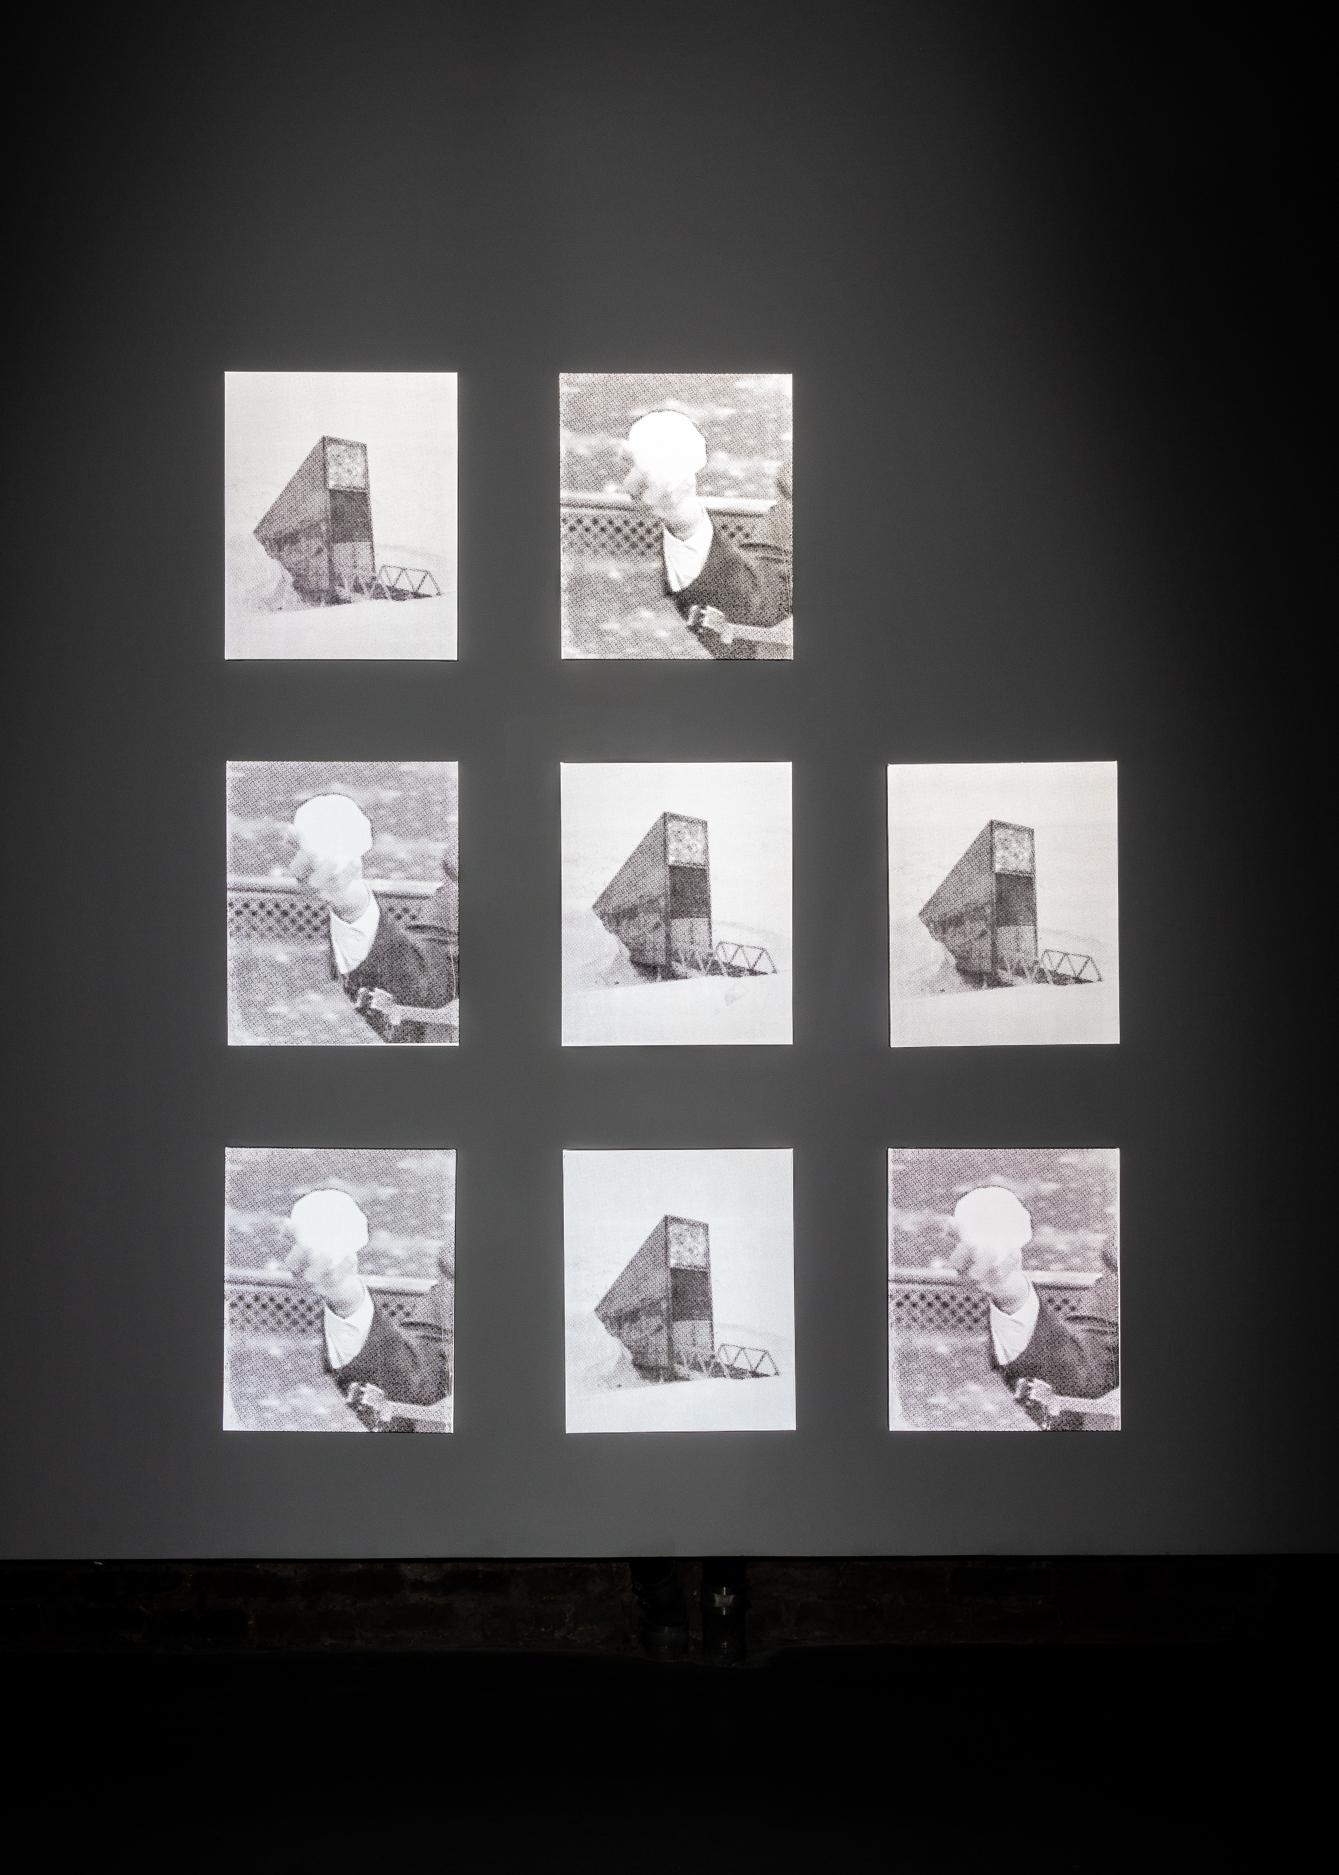 Patrick Harkin_Harvesters Dilemma (Tic-Tac-Toe (Inhofe vs Svalbard))_2019_Silk Screen on Anti-Photographic Fabric_75 x 60.jpg